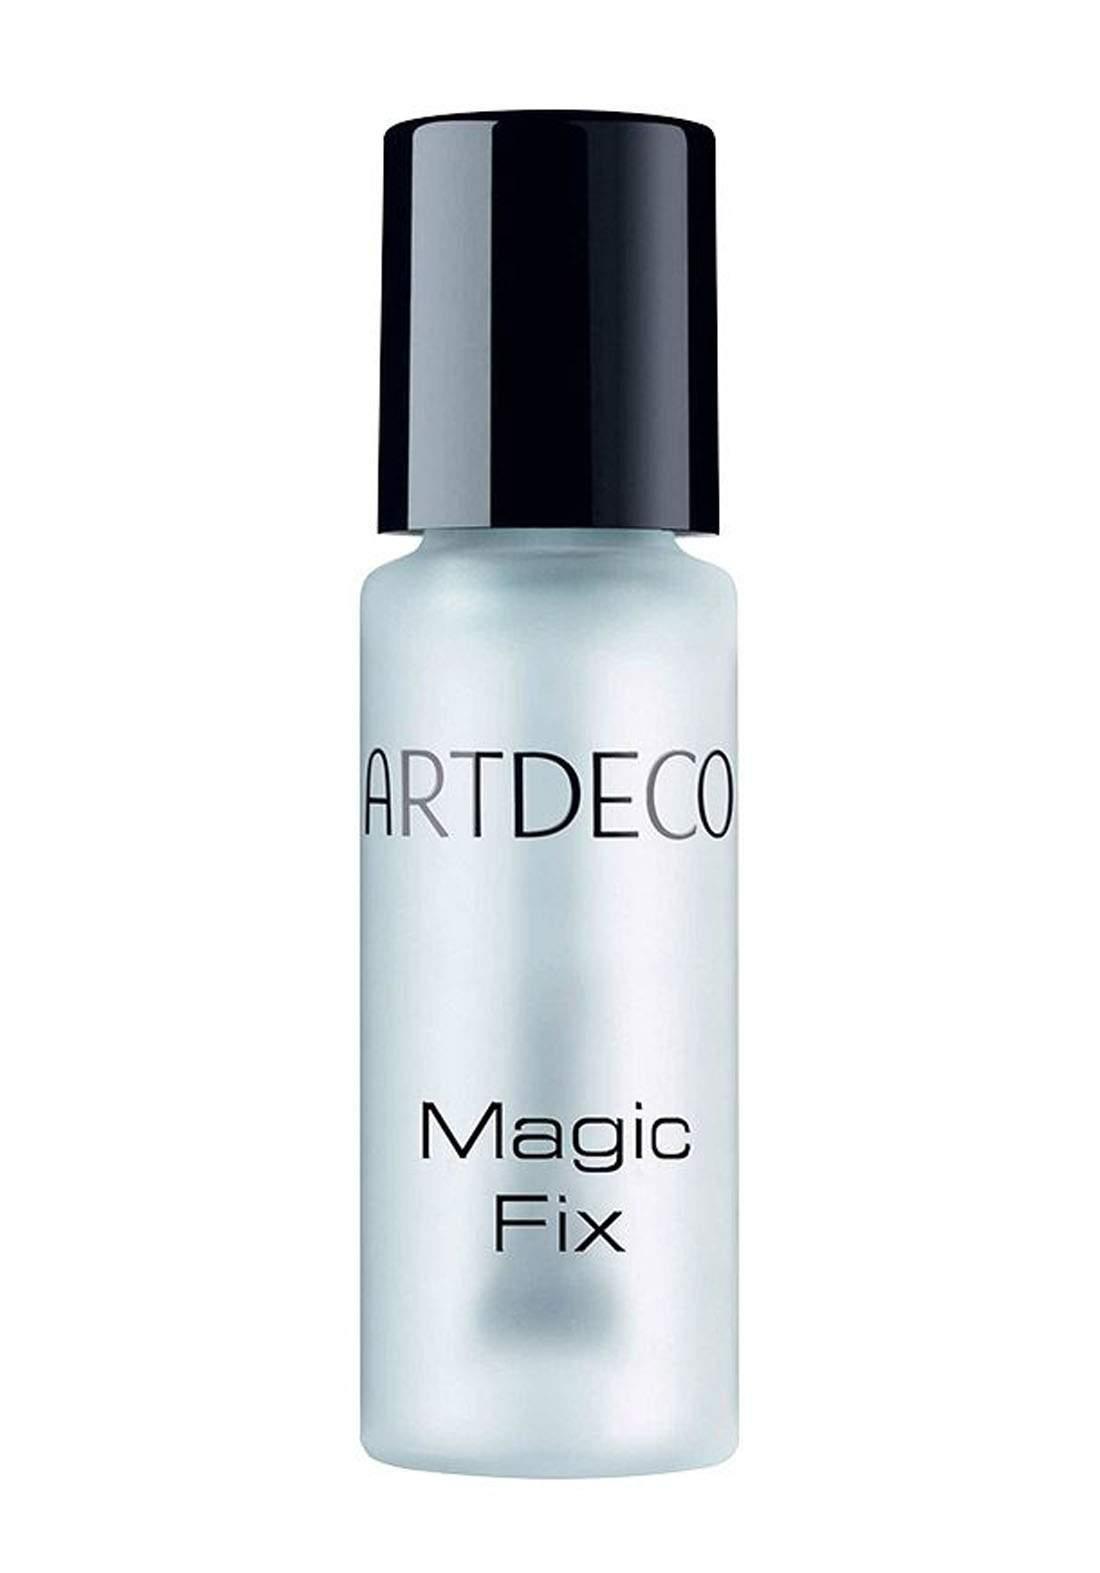 Artdeco Magic Fix 5 ml مثبت احمر الشفاه